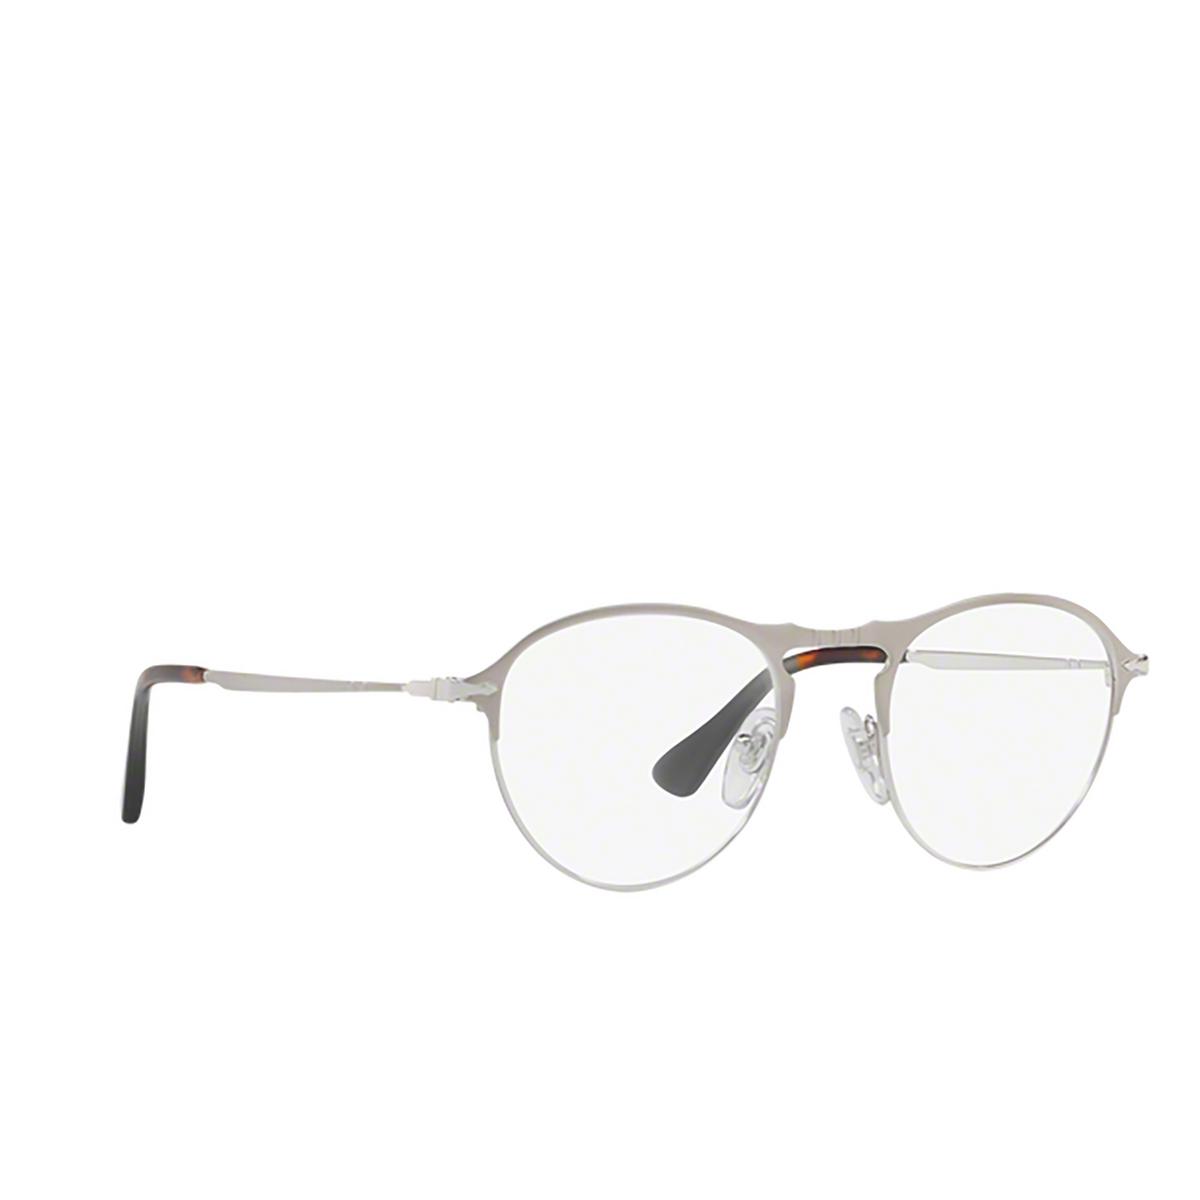 Persol® Round Eyeglasses: PO7092V color Matte Silver / Silver 1068 - three-quarters view.